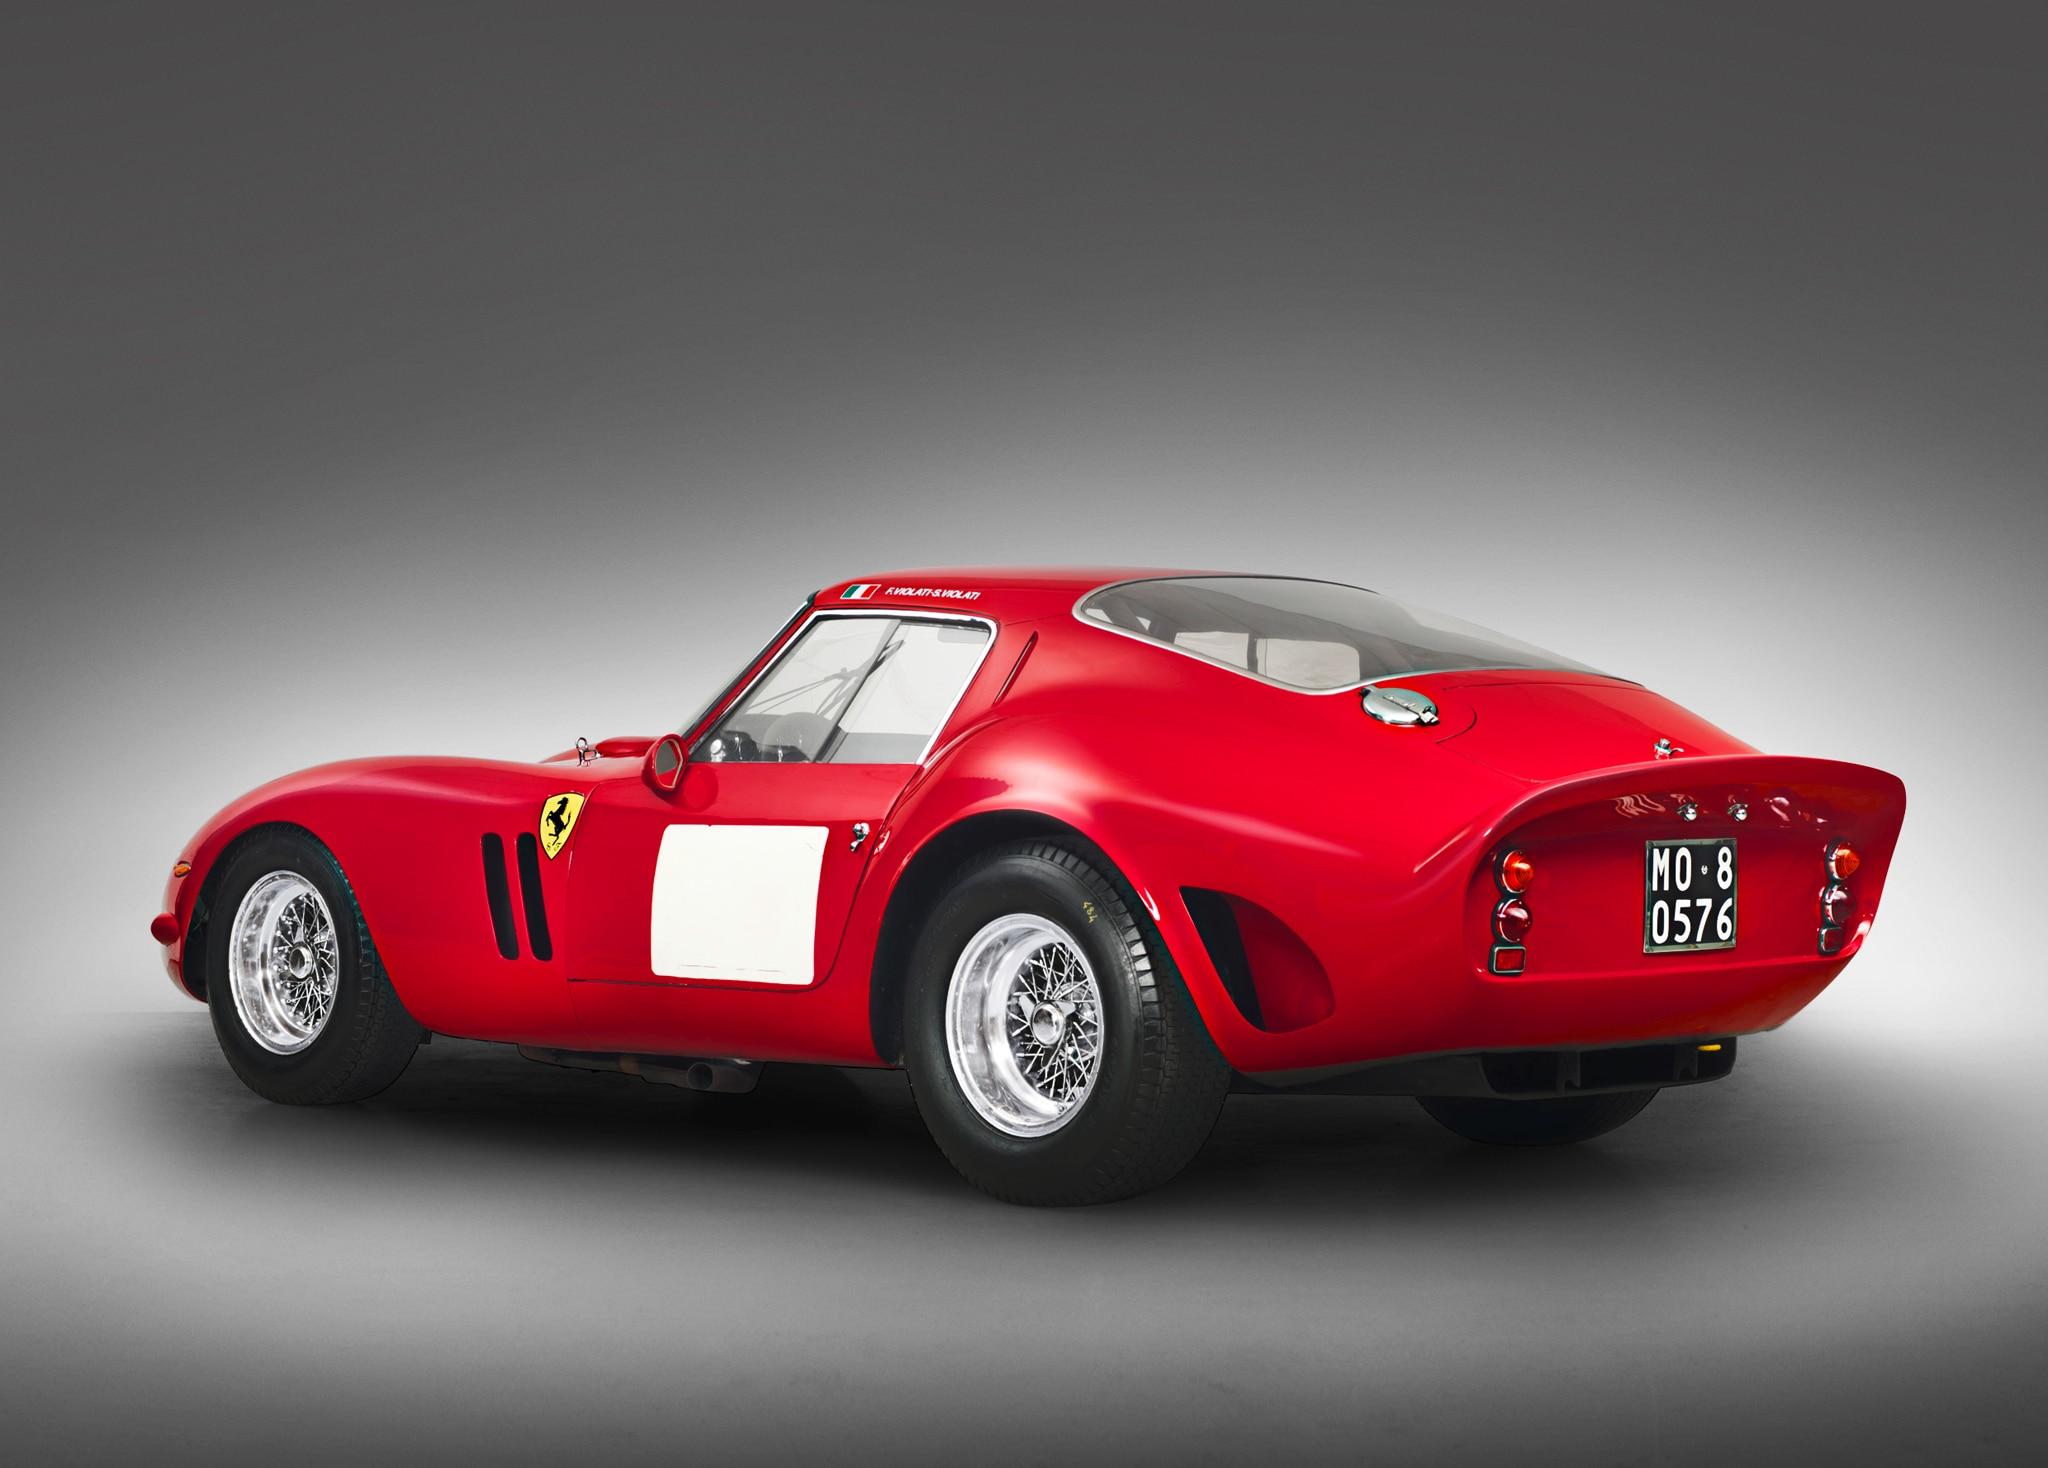 1962 Ferrari 250 GTO Berlinetta Rear Three Quarter1